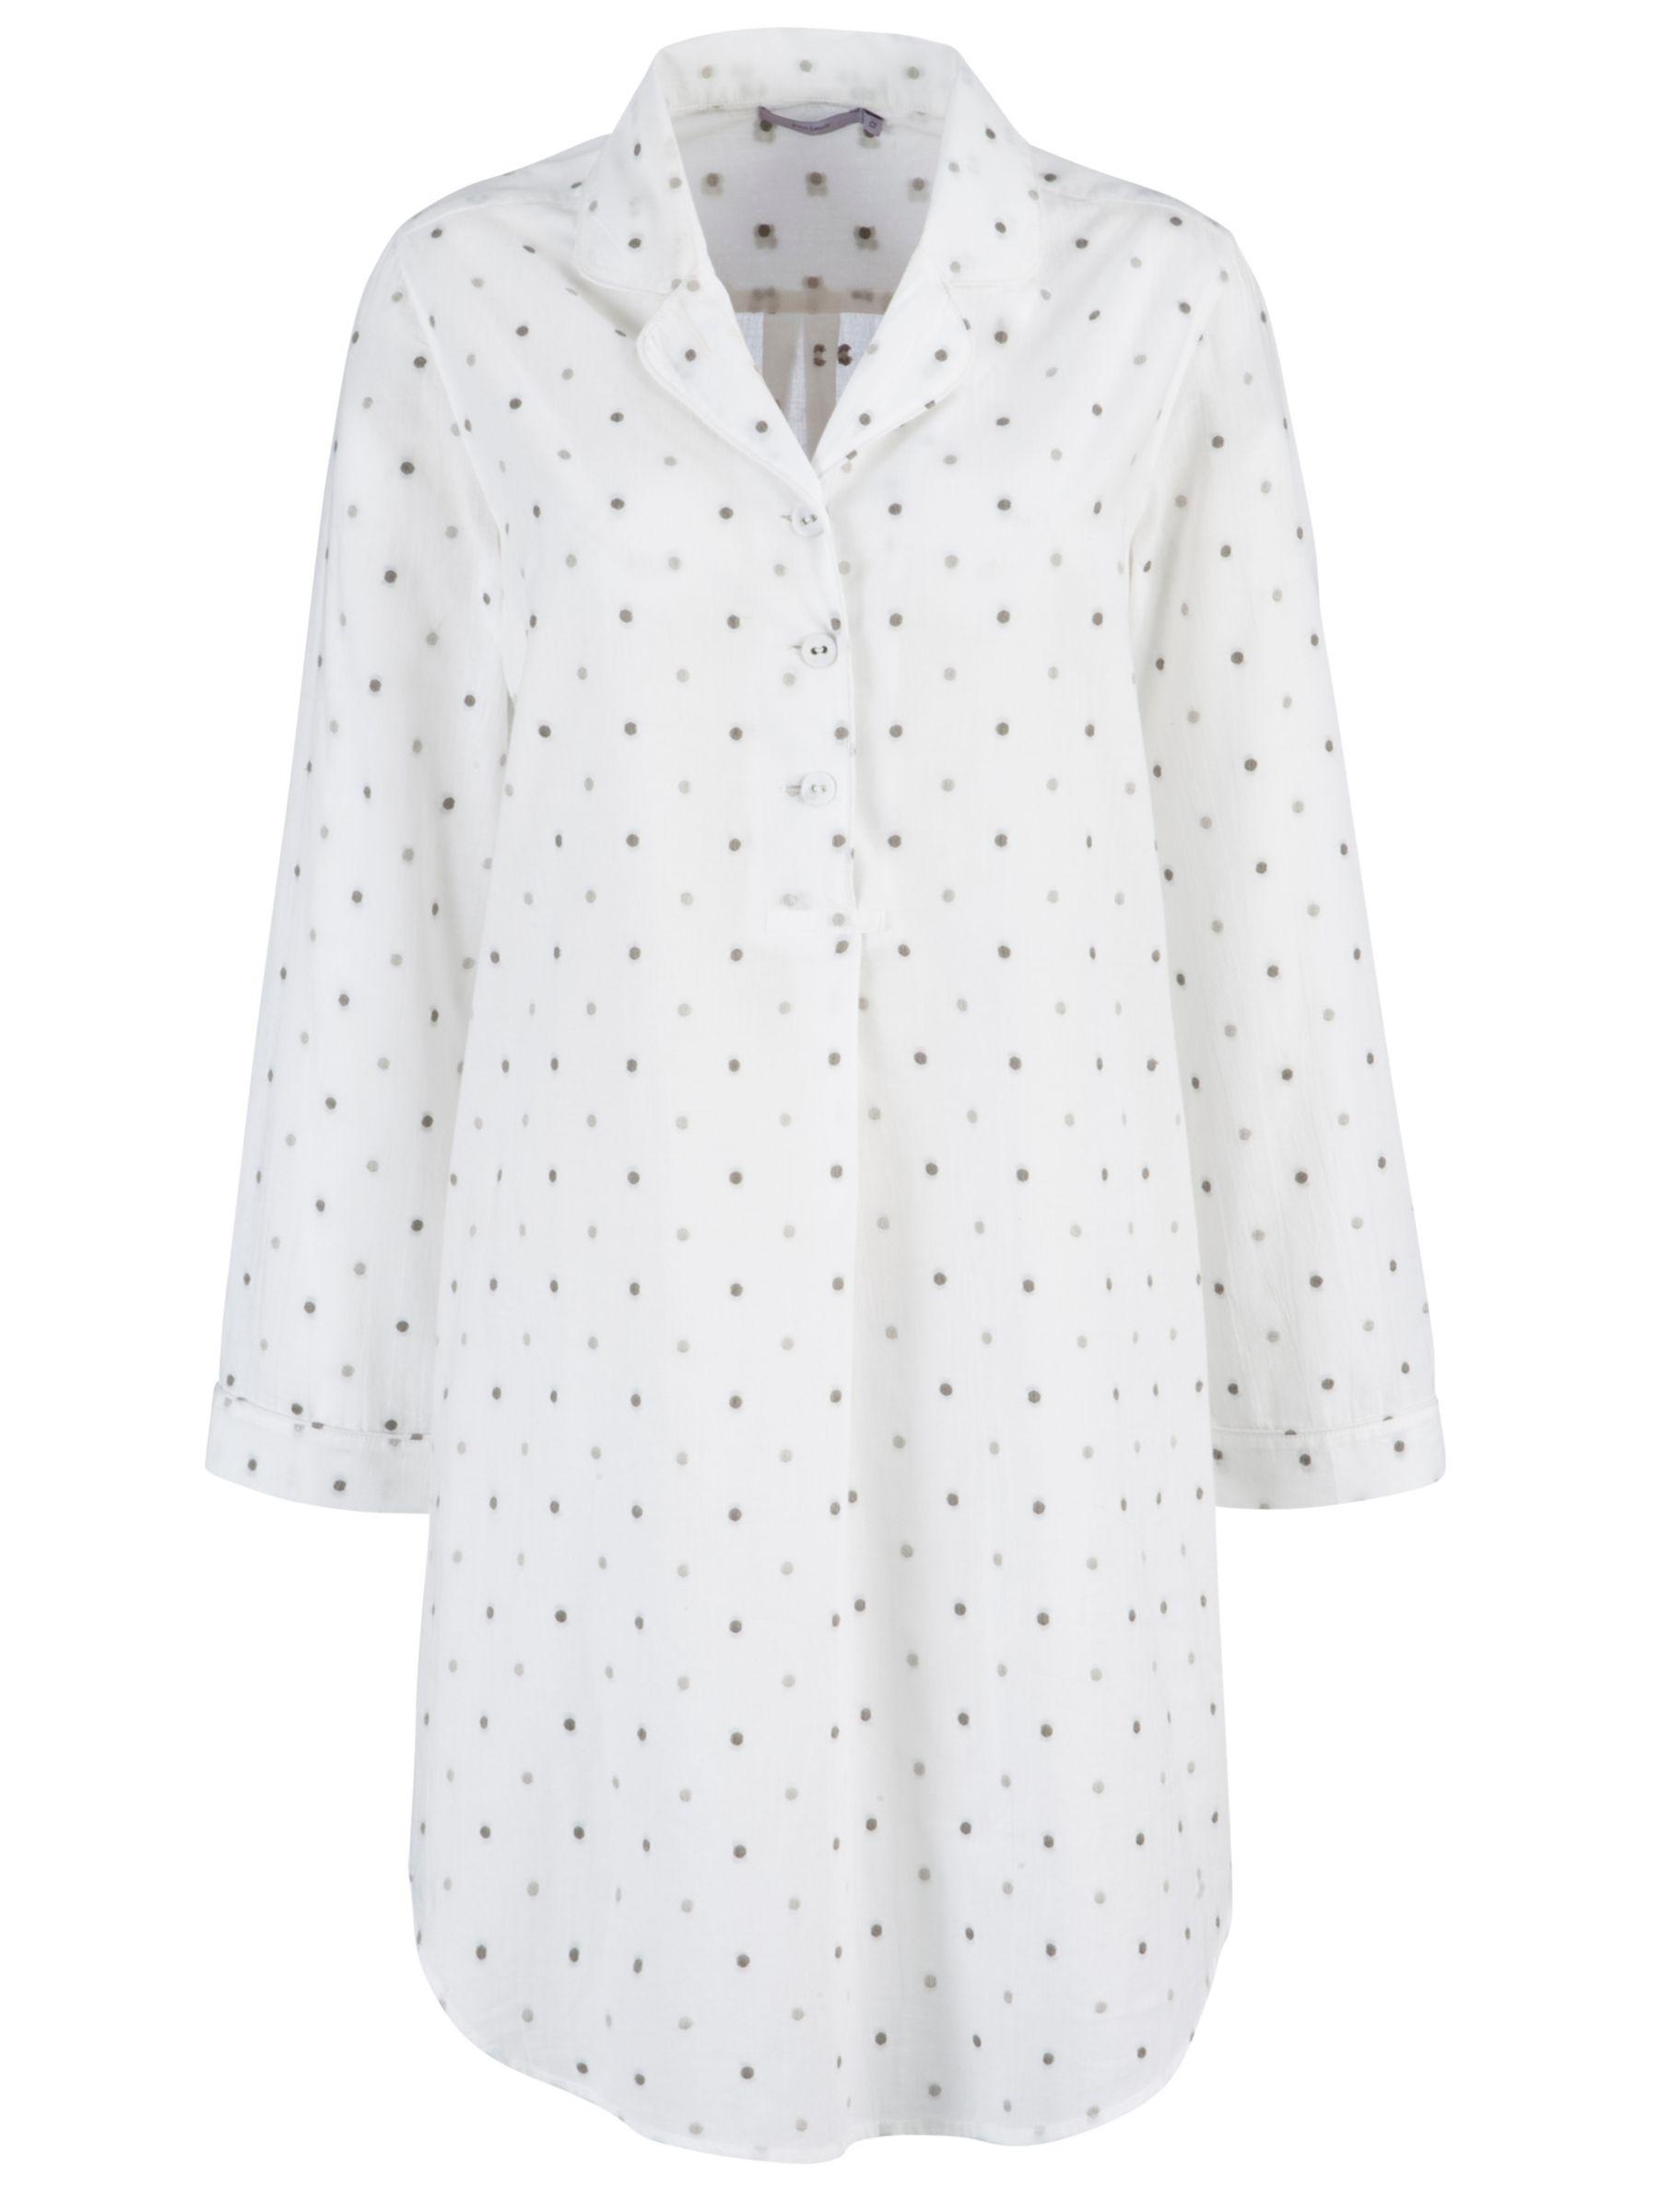 John Lewis Dobby Spot Nightshirt, White/Grey